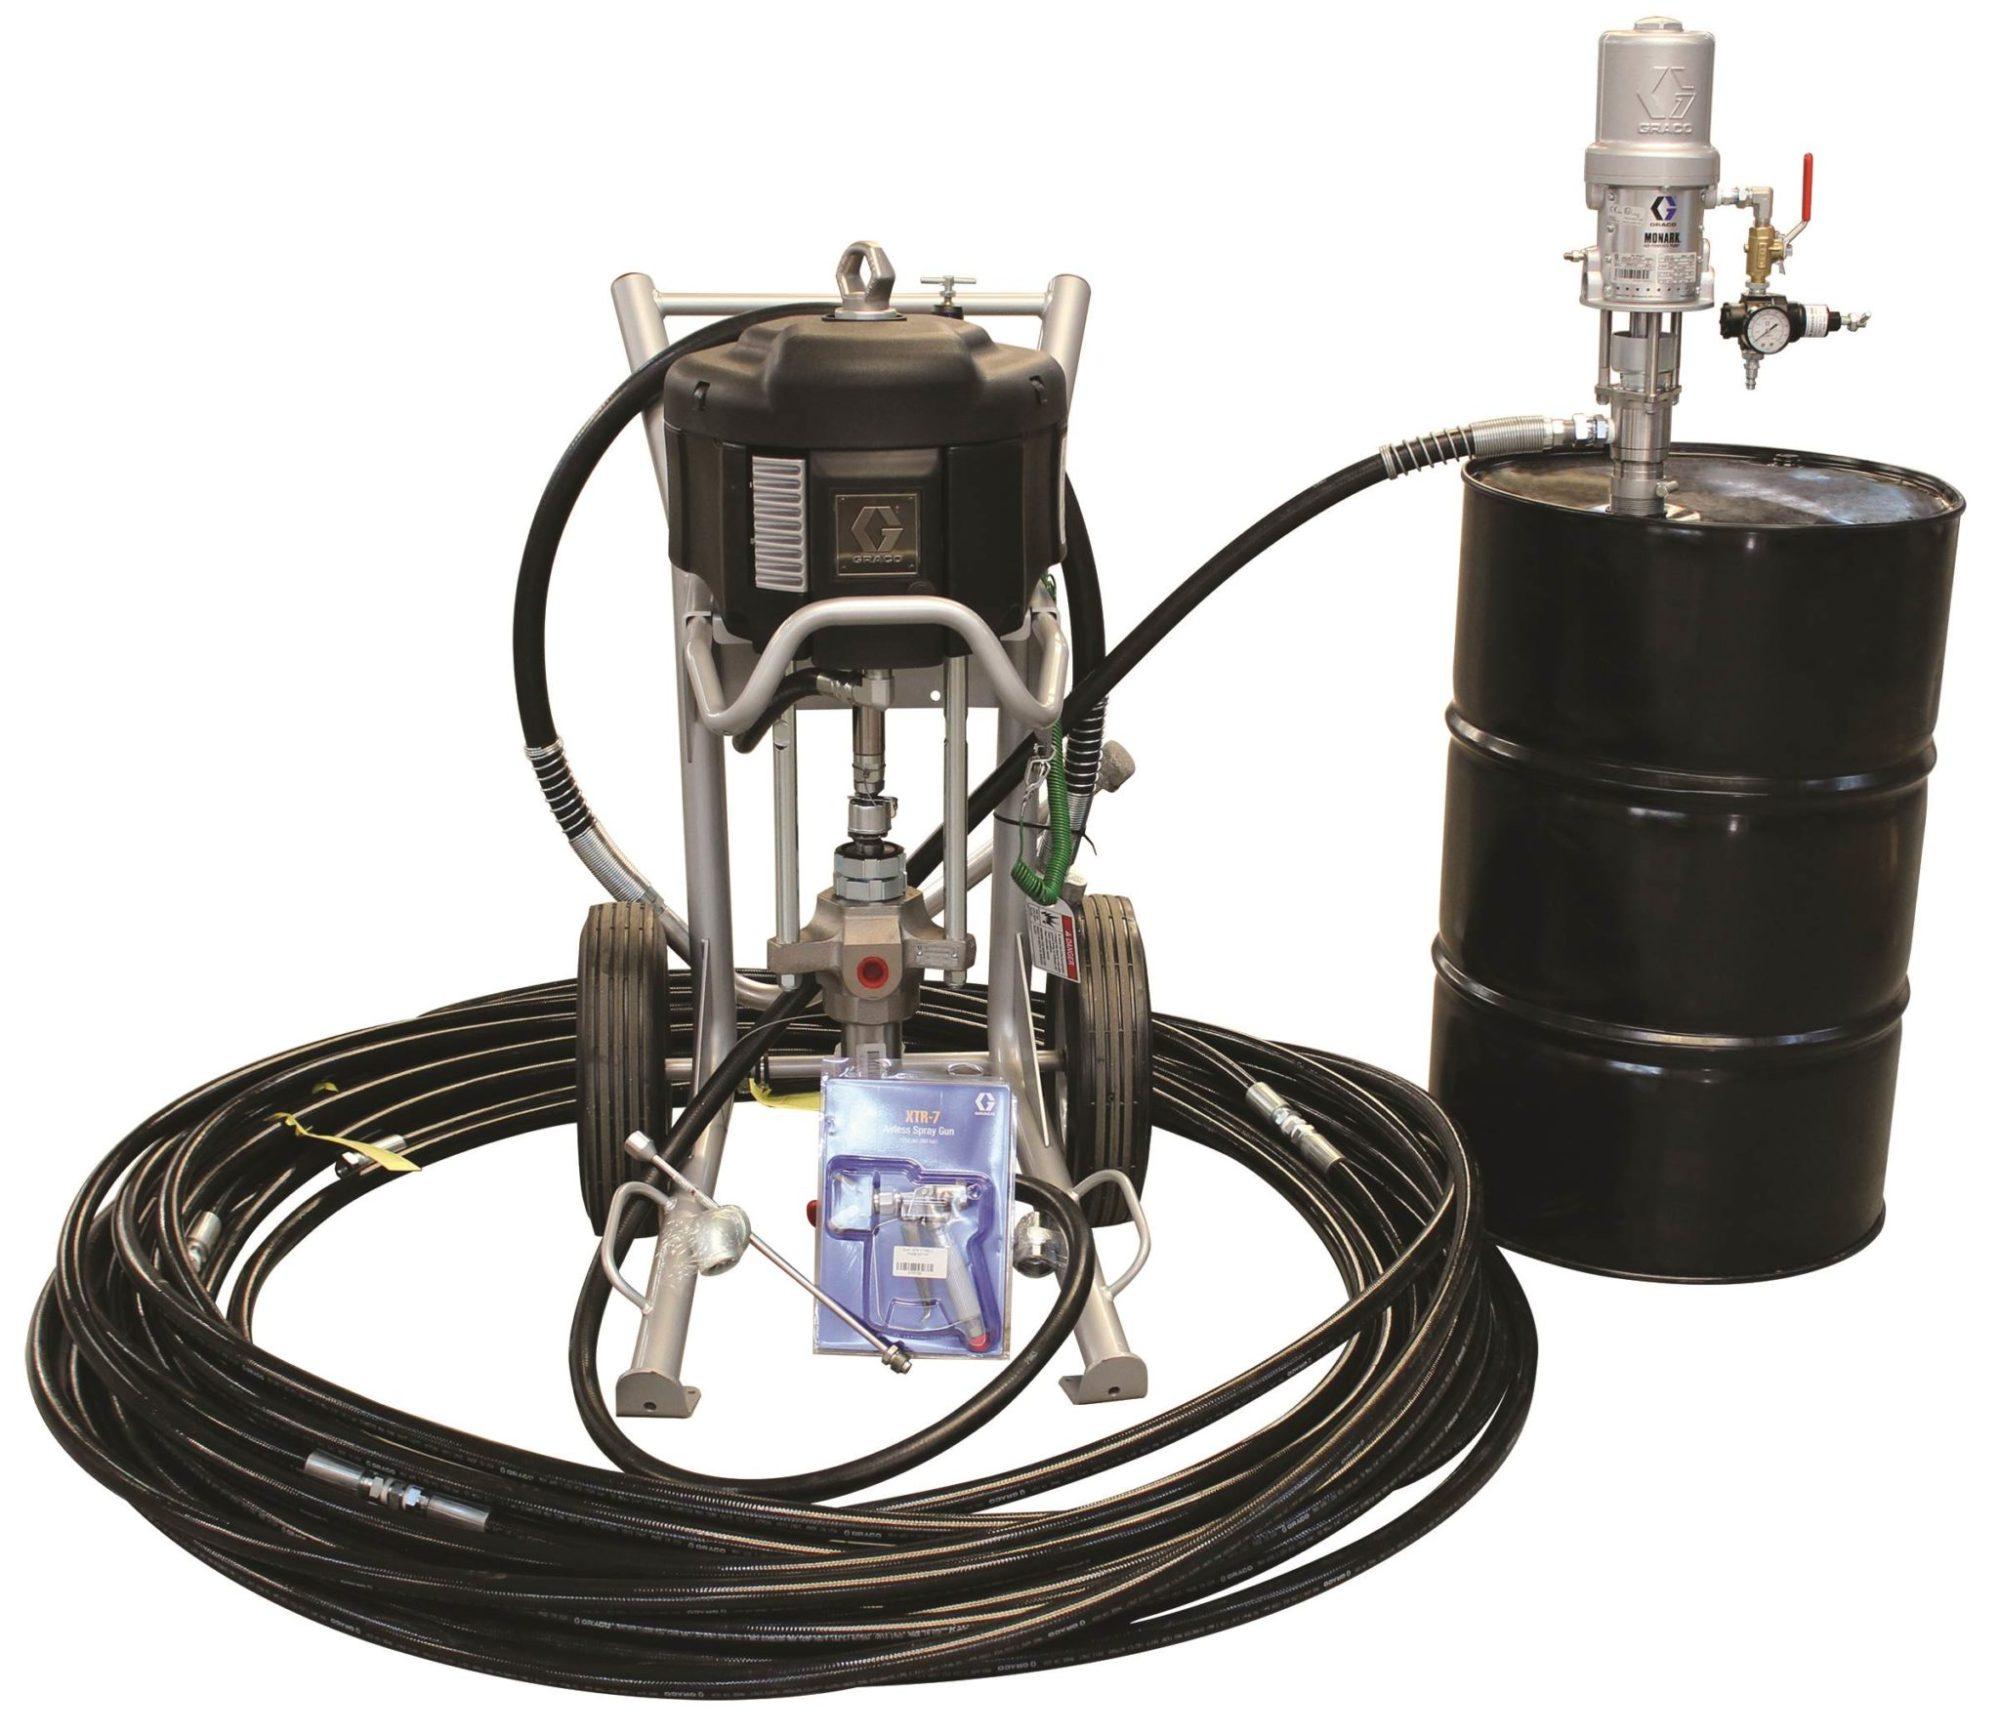 hight resolution of graco complete king pump xtreme airless sprayer package xtr700 gun 310 hose monarch pump